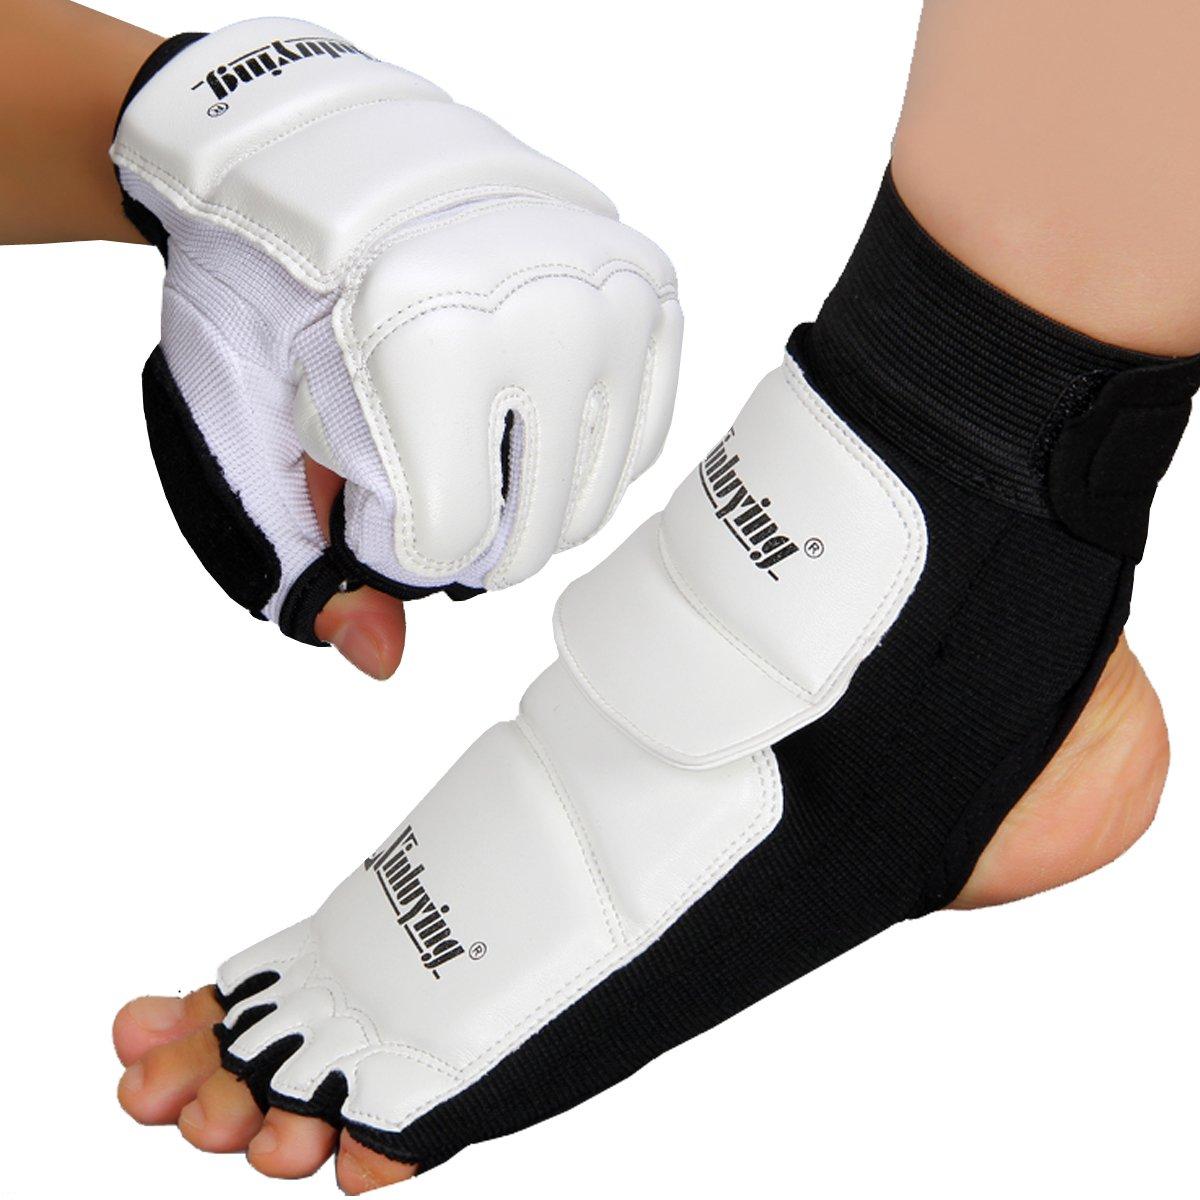 Xinluying MMA Fußschützer Knöchelschoner Kickboxen Kampfsport Taekwondo Sparring Boxsack Training Pads Kinder Herren Damen